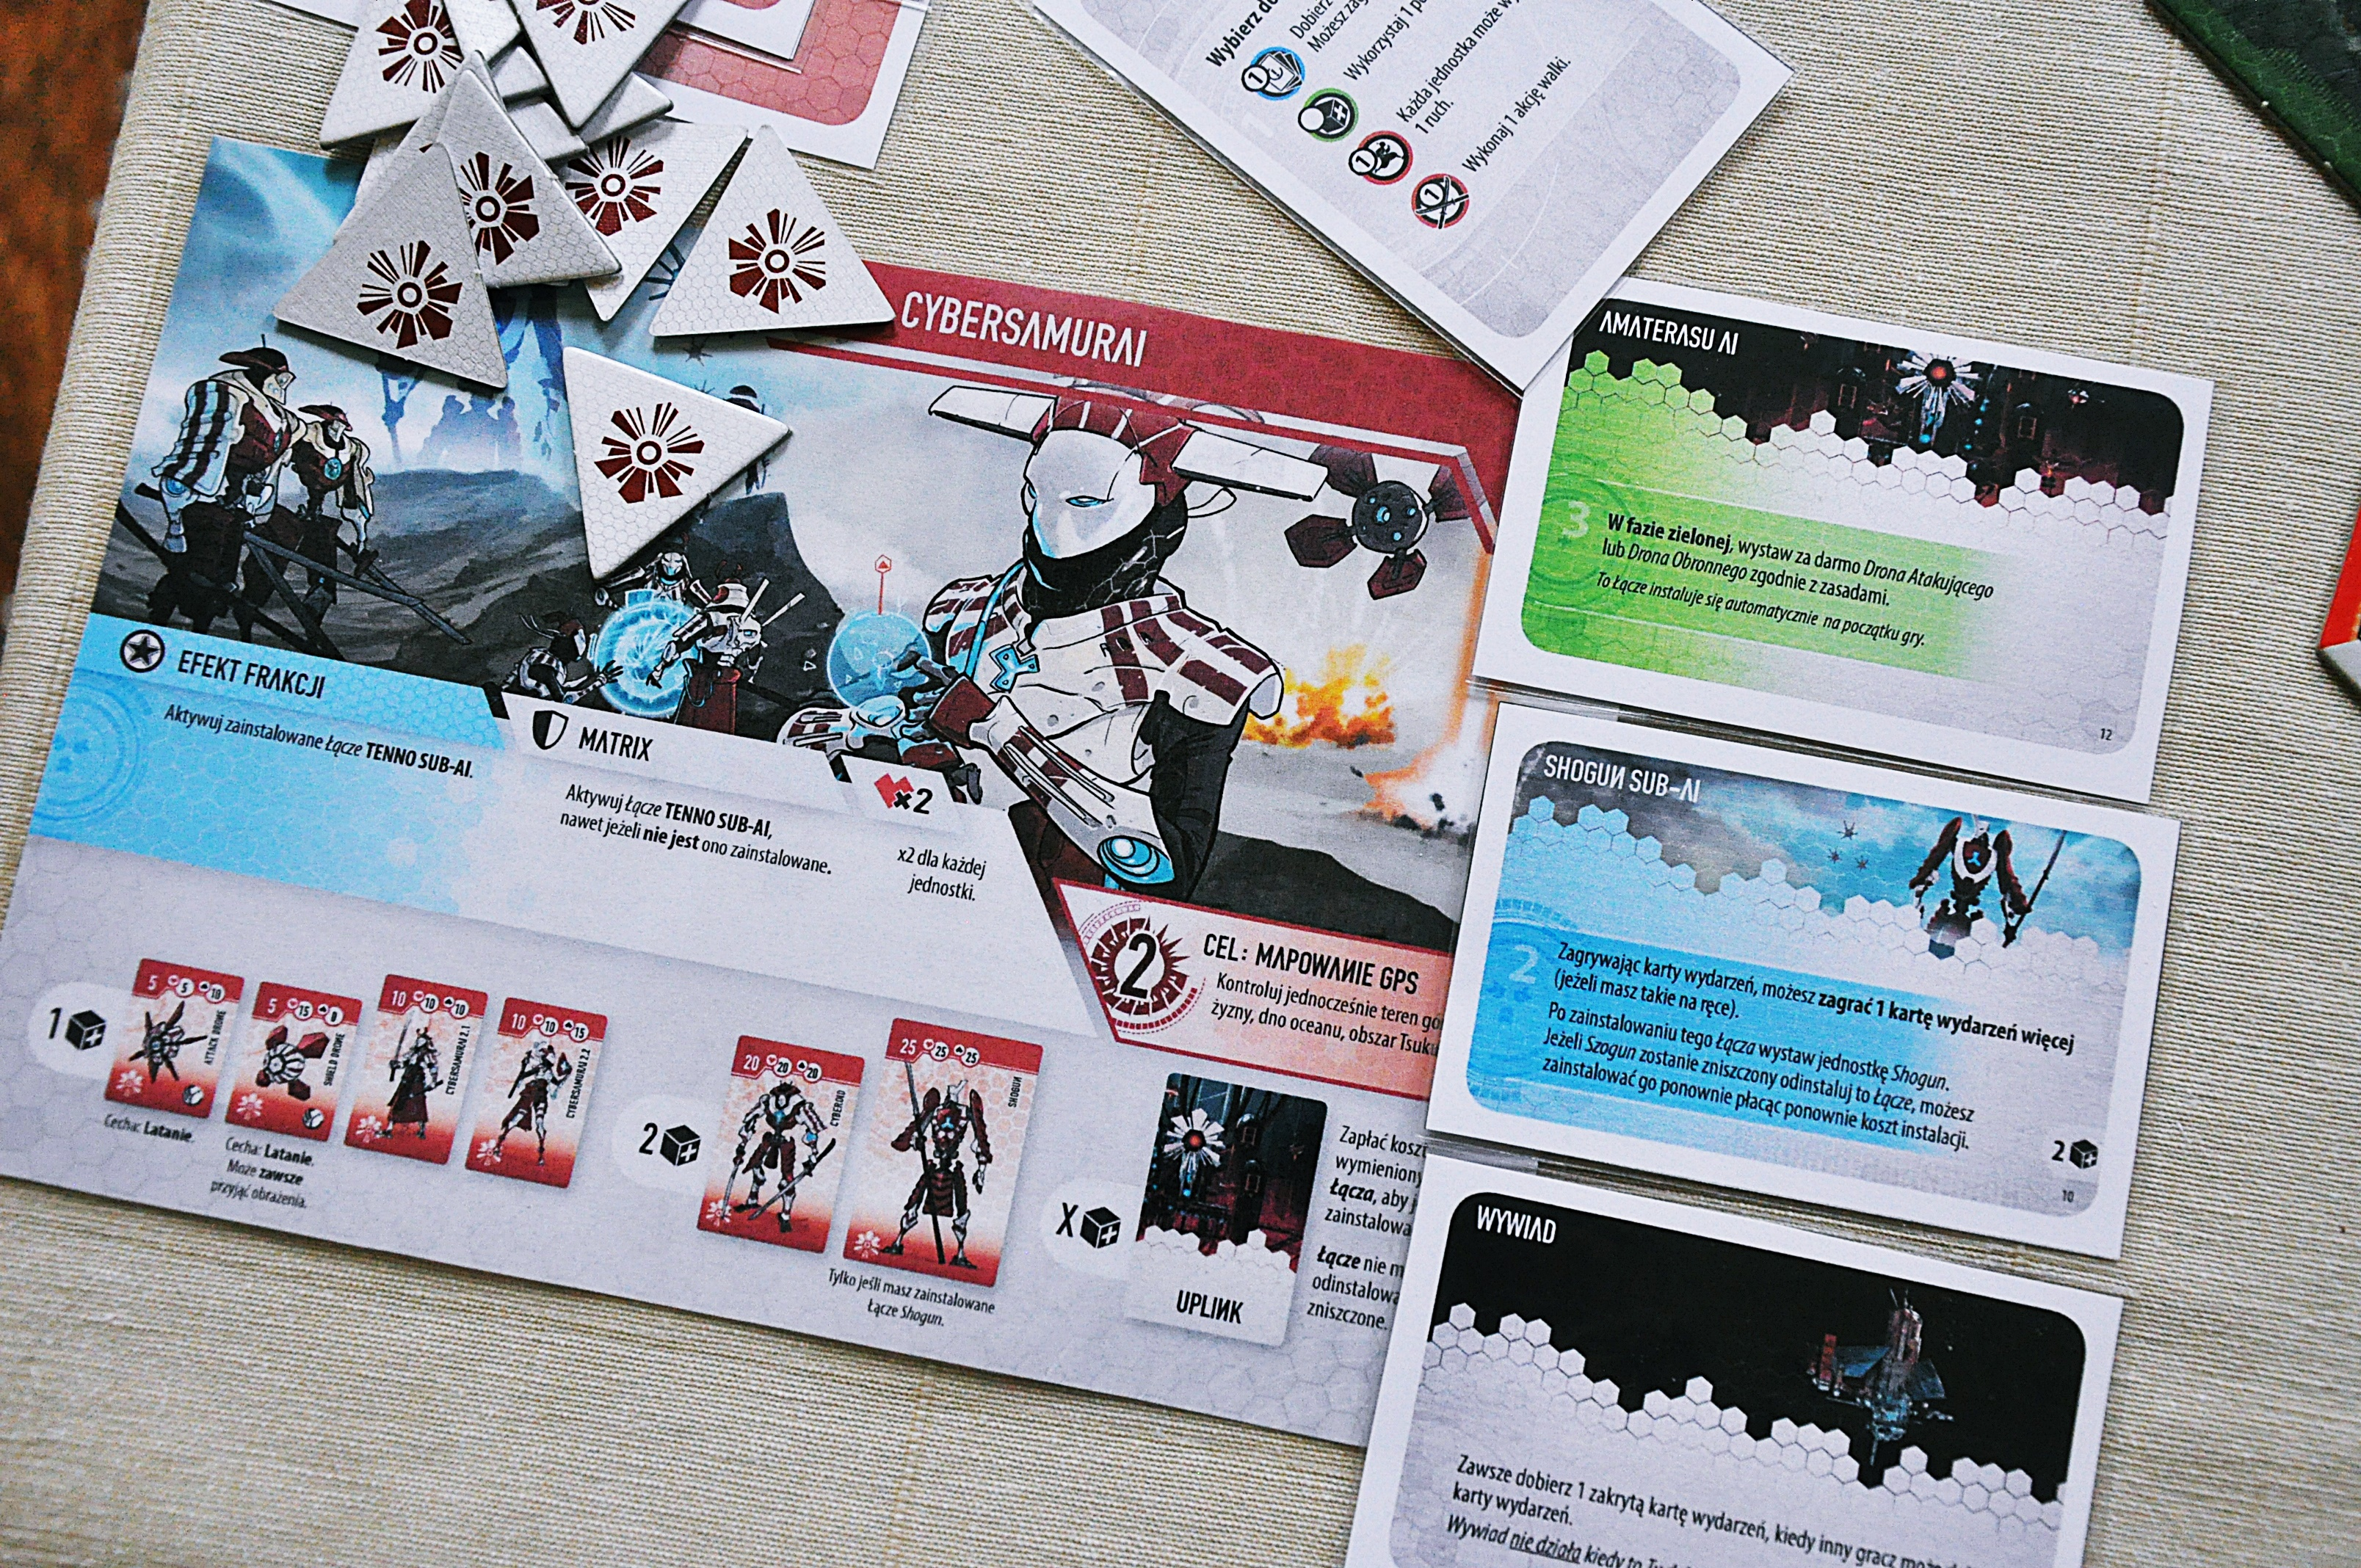 Planszetka frakcji Cybersamurai